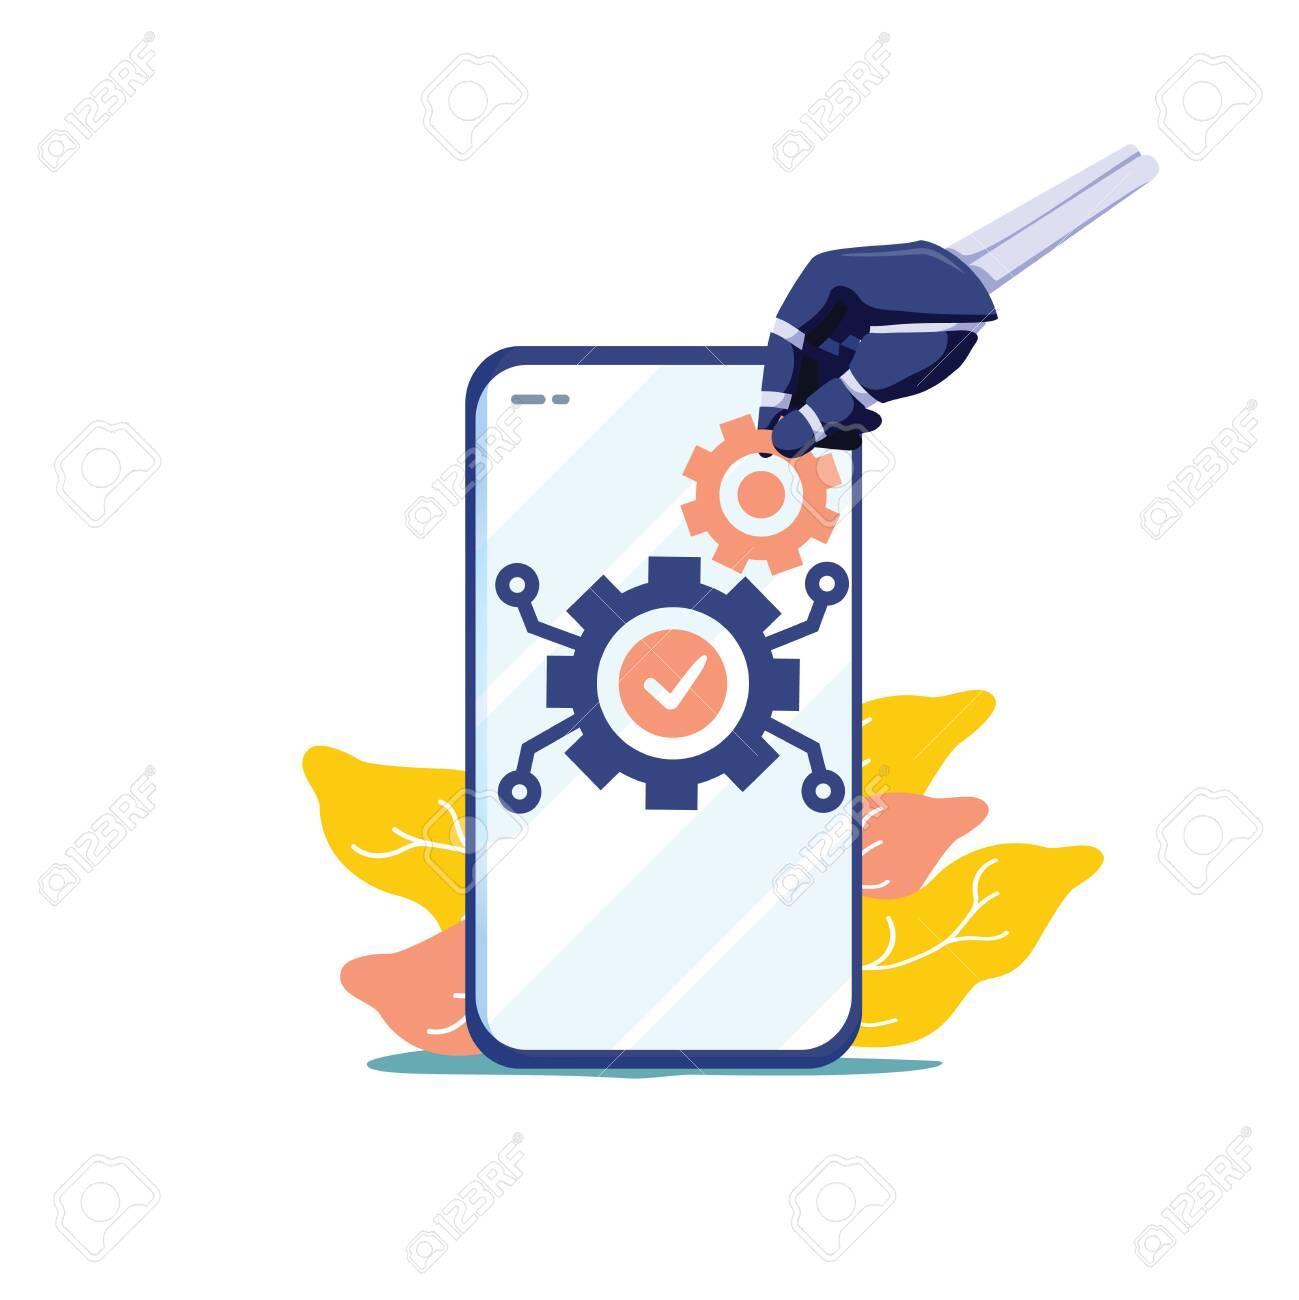 Human resources automation vector illustration. Flat tiny person work concept. 21st century challenge - workforce employment social crisis. Digital era algorithm artificial intelligence domination. - 124424489